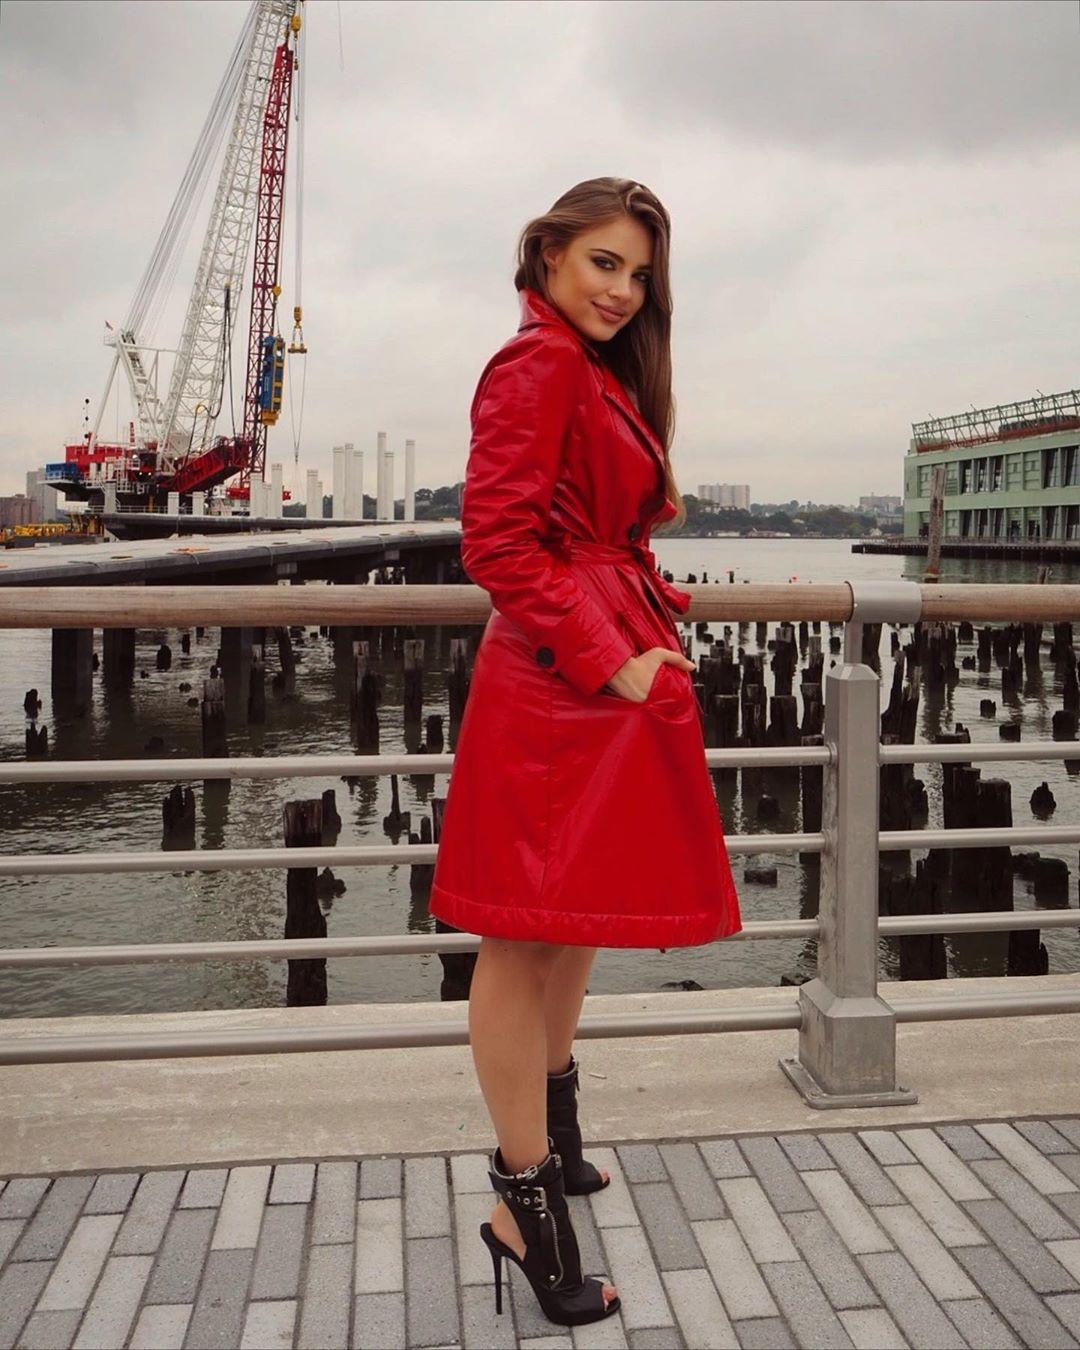 Xenia Tchoumitcheva dress trench coat, coat cute outfit ideas